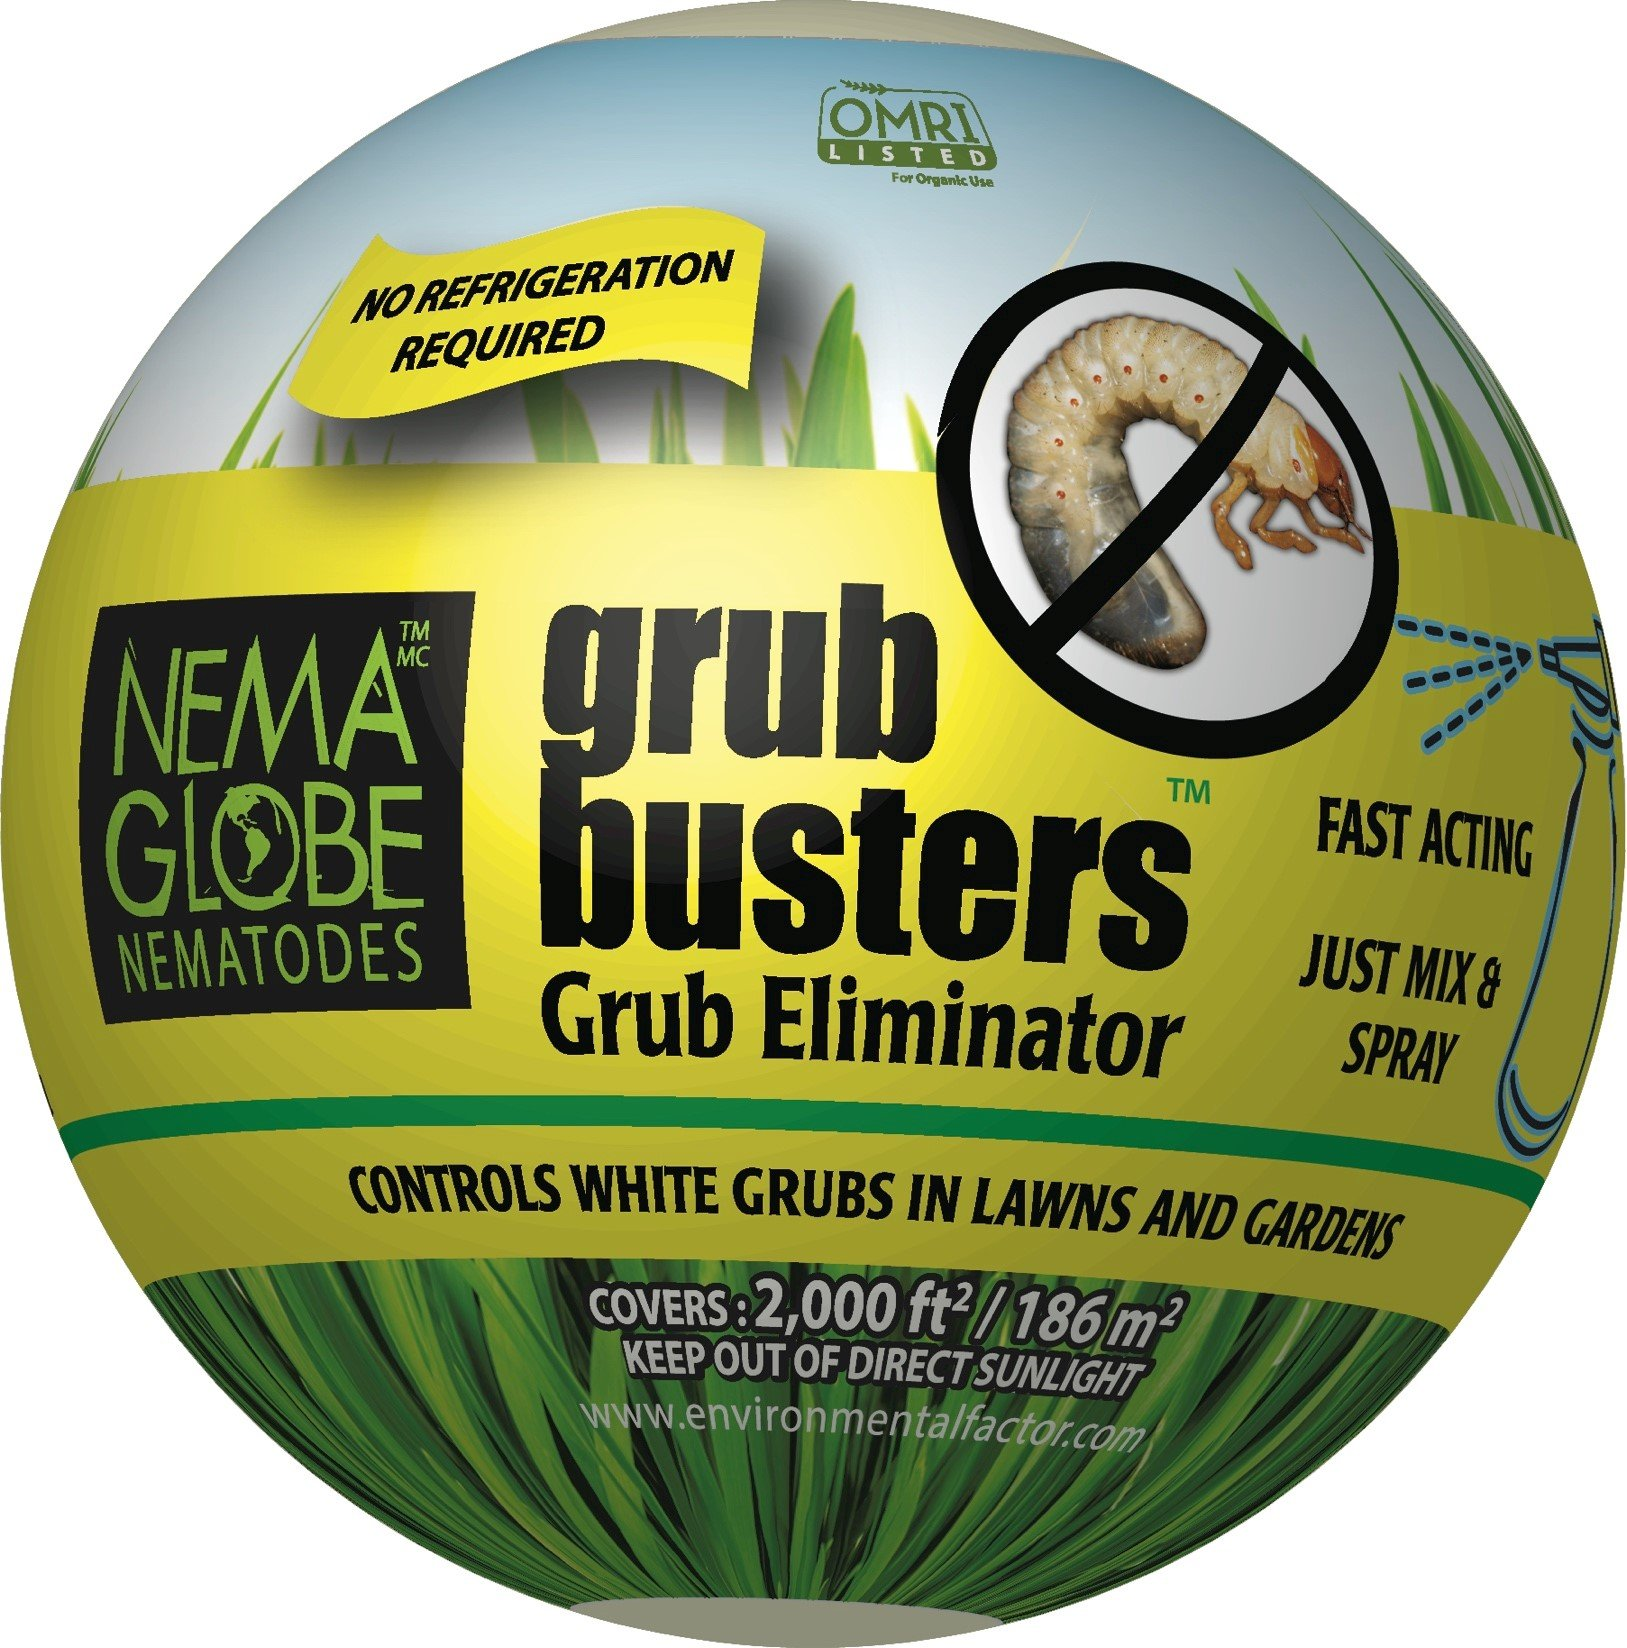 40 Million Beneficial Nematodes (H.bacteriophora) - Nema Globe Grub Buster for Pest Control - New ''No Refrigeration Required'' Formula